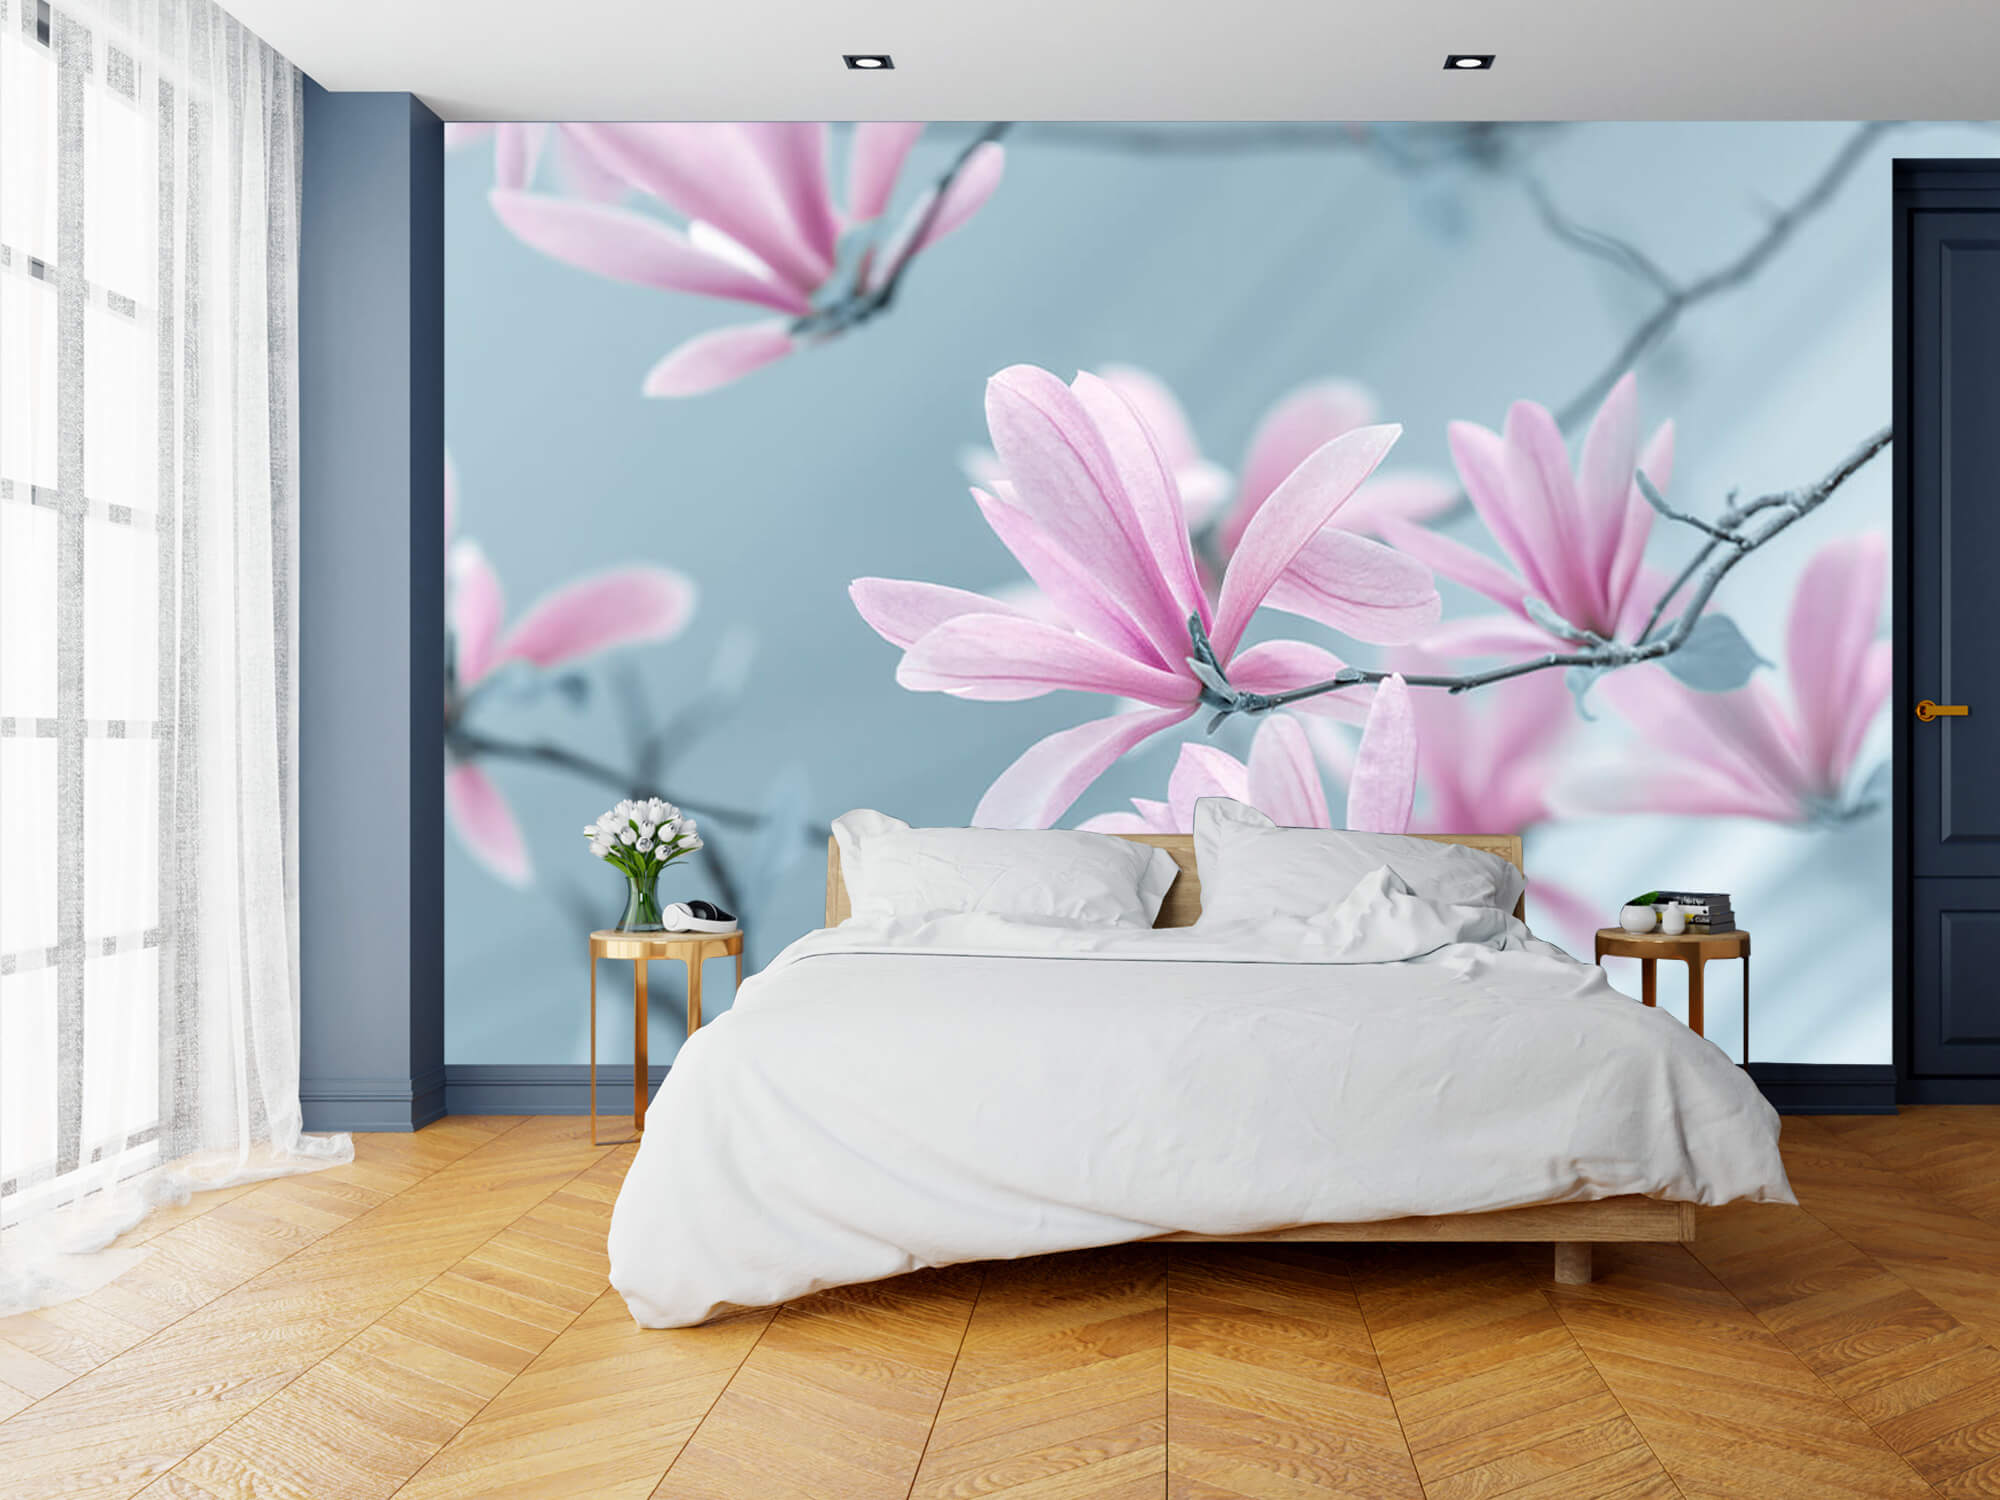 Magnolia bloemen 11